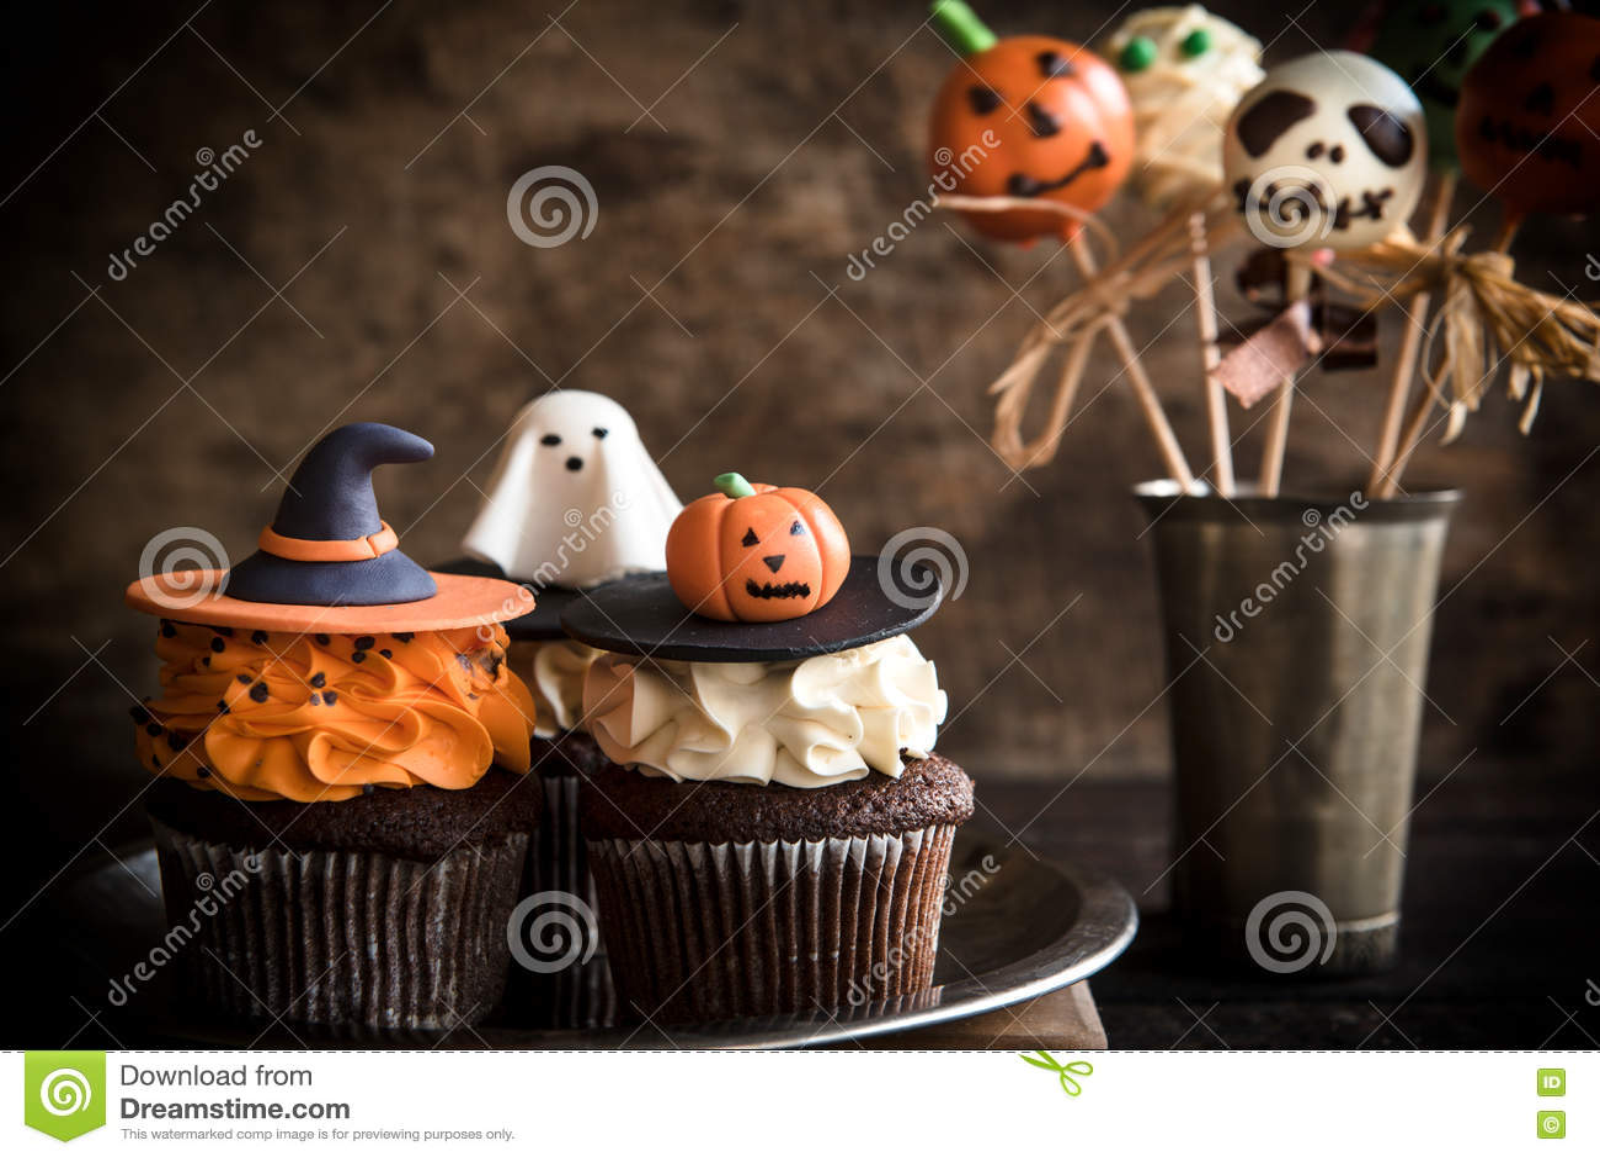 Funny Halloween Desserts Stock Photo - Image: 77219626